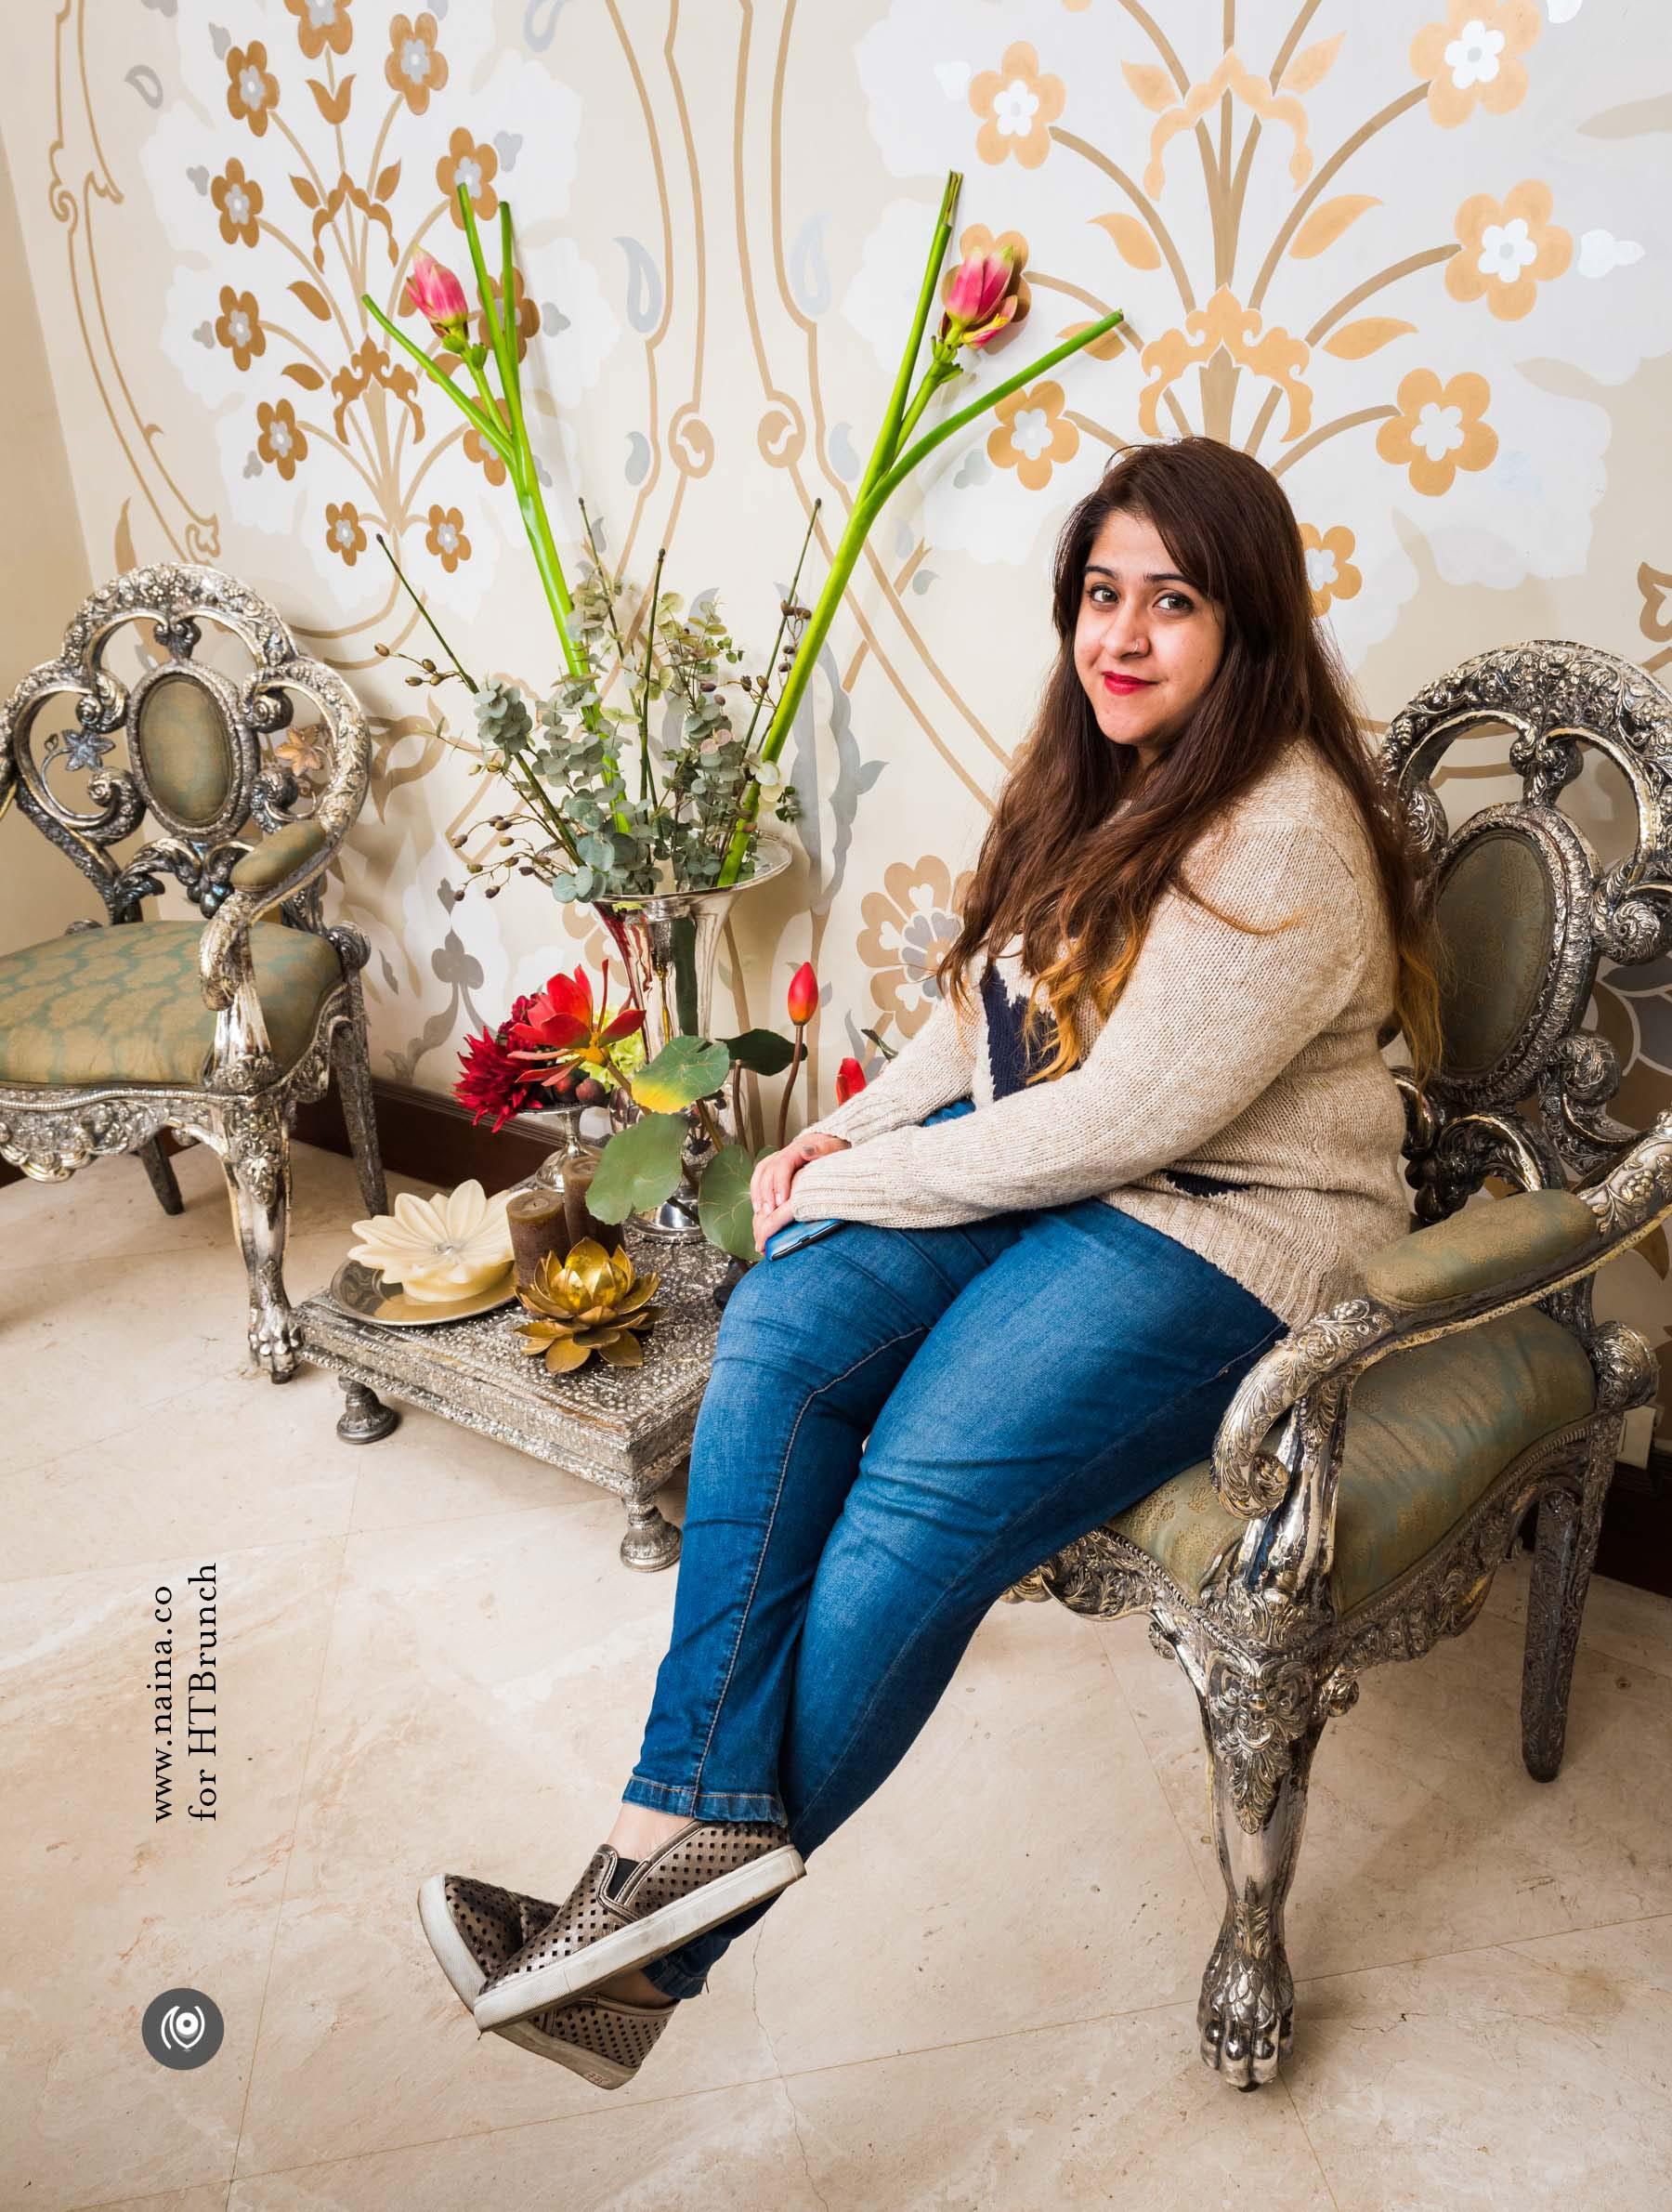 Naina.co, Naina Redhu, Hindustan Times, HTBrunch, Jamal Shaikh, Samreen, Soha Ali Khan Pataudi, sakpataudi, Sharmila Tagore, Cover Shoot, Professional Photographer, Cover Photographer, Bollywood, Actors, LikeMyMother, Grace, Grandeur, Grey Hair, Wellness, Media Marketing, HMIndia, On The Cover, Her Mother's Daughter, Health, Magazine, EyesForLifestyle, Lifestyle Photographer, Luxury Photographer, Lifestyle Blogger, Luxury Blogger, Lifestyle Photographer India, Luxury Photographer India, Lifestyle Blogger India, Luxury Blogger India, Influencer, Lifestyle Influencer, Luxury Influencer, Lifestyle Influencer India, Luxury Influencer India, Photography Influencer, Photography Influencer India